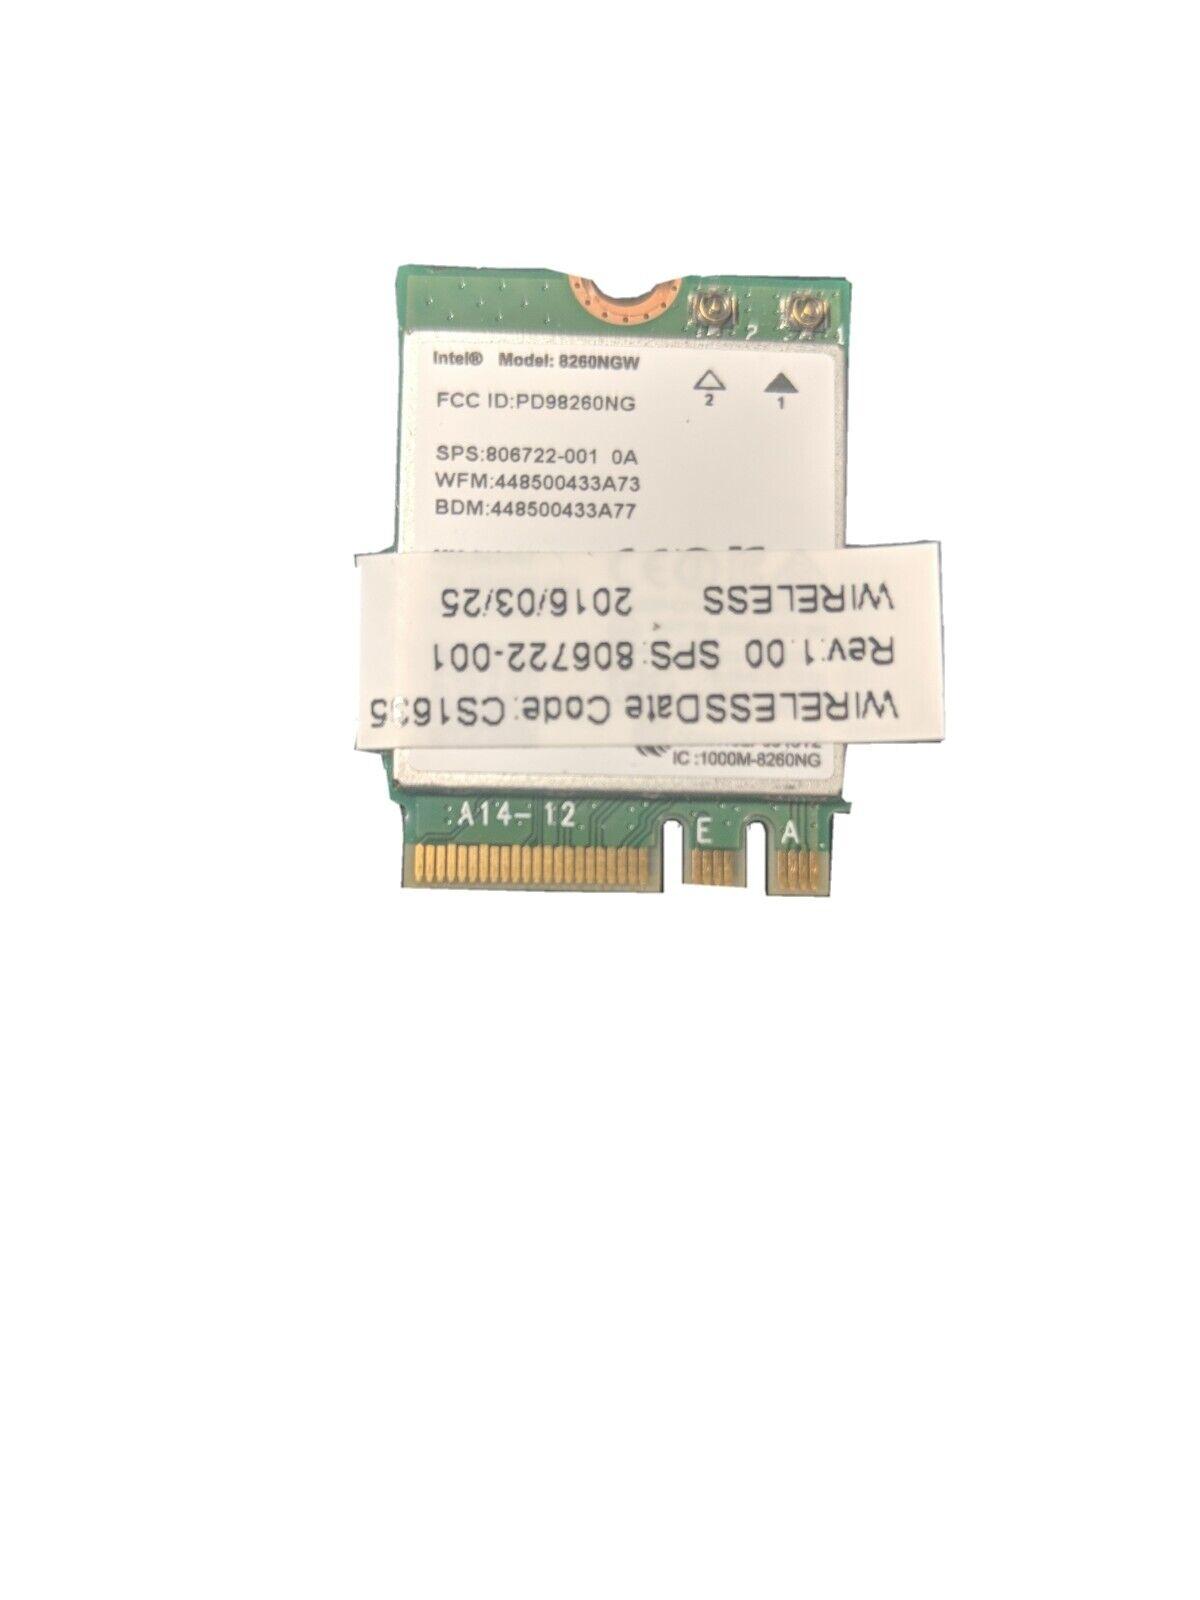 Intel WiFi Wireless Network Card 802.11 Bluetooth ngff